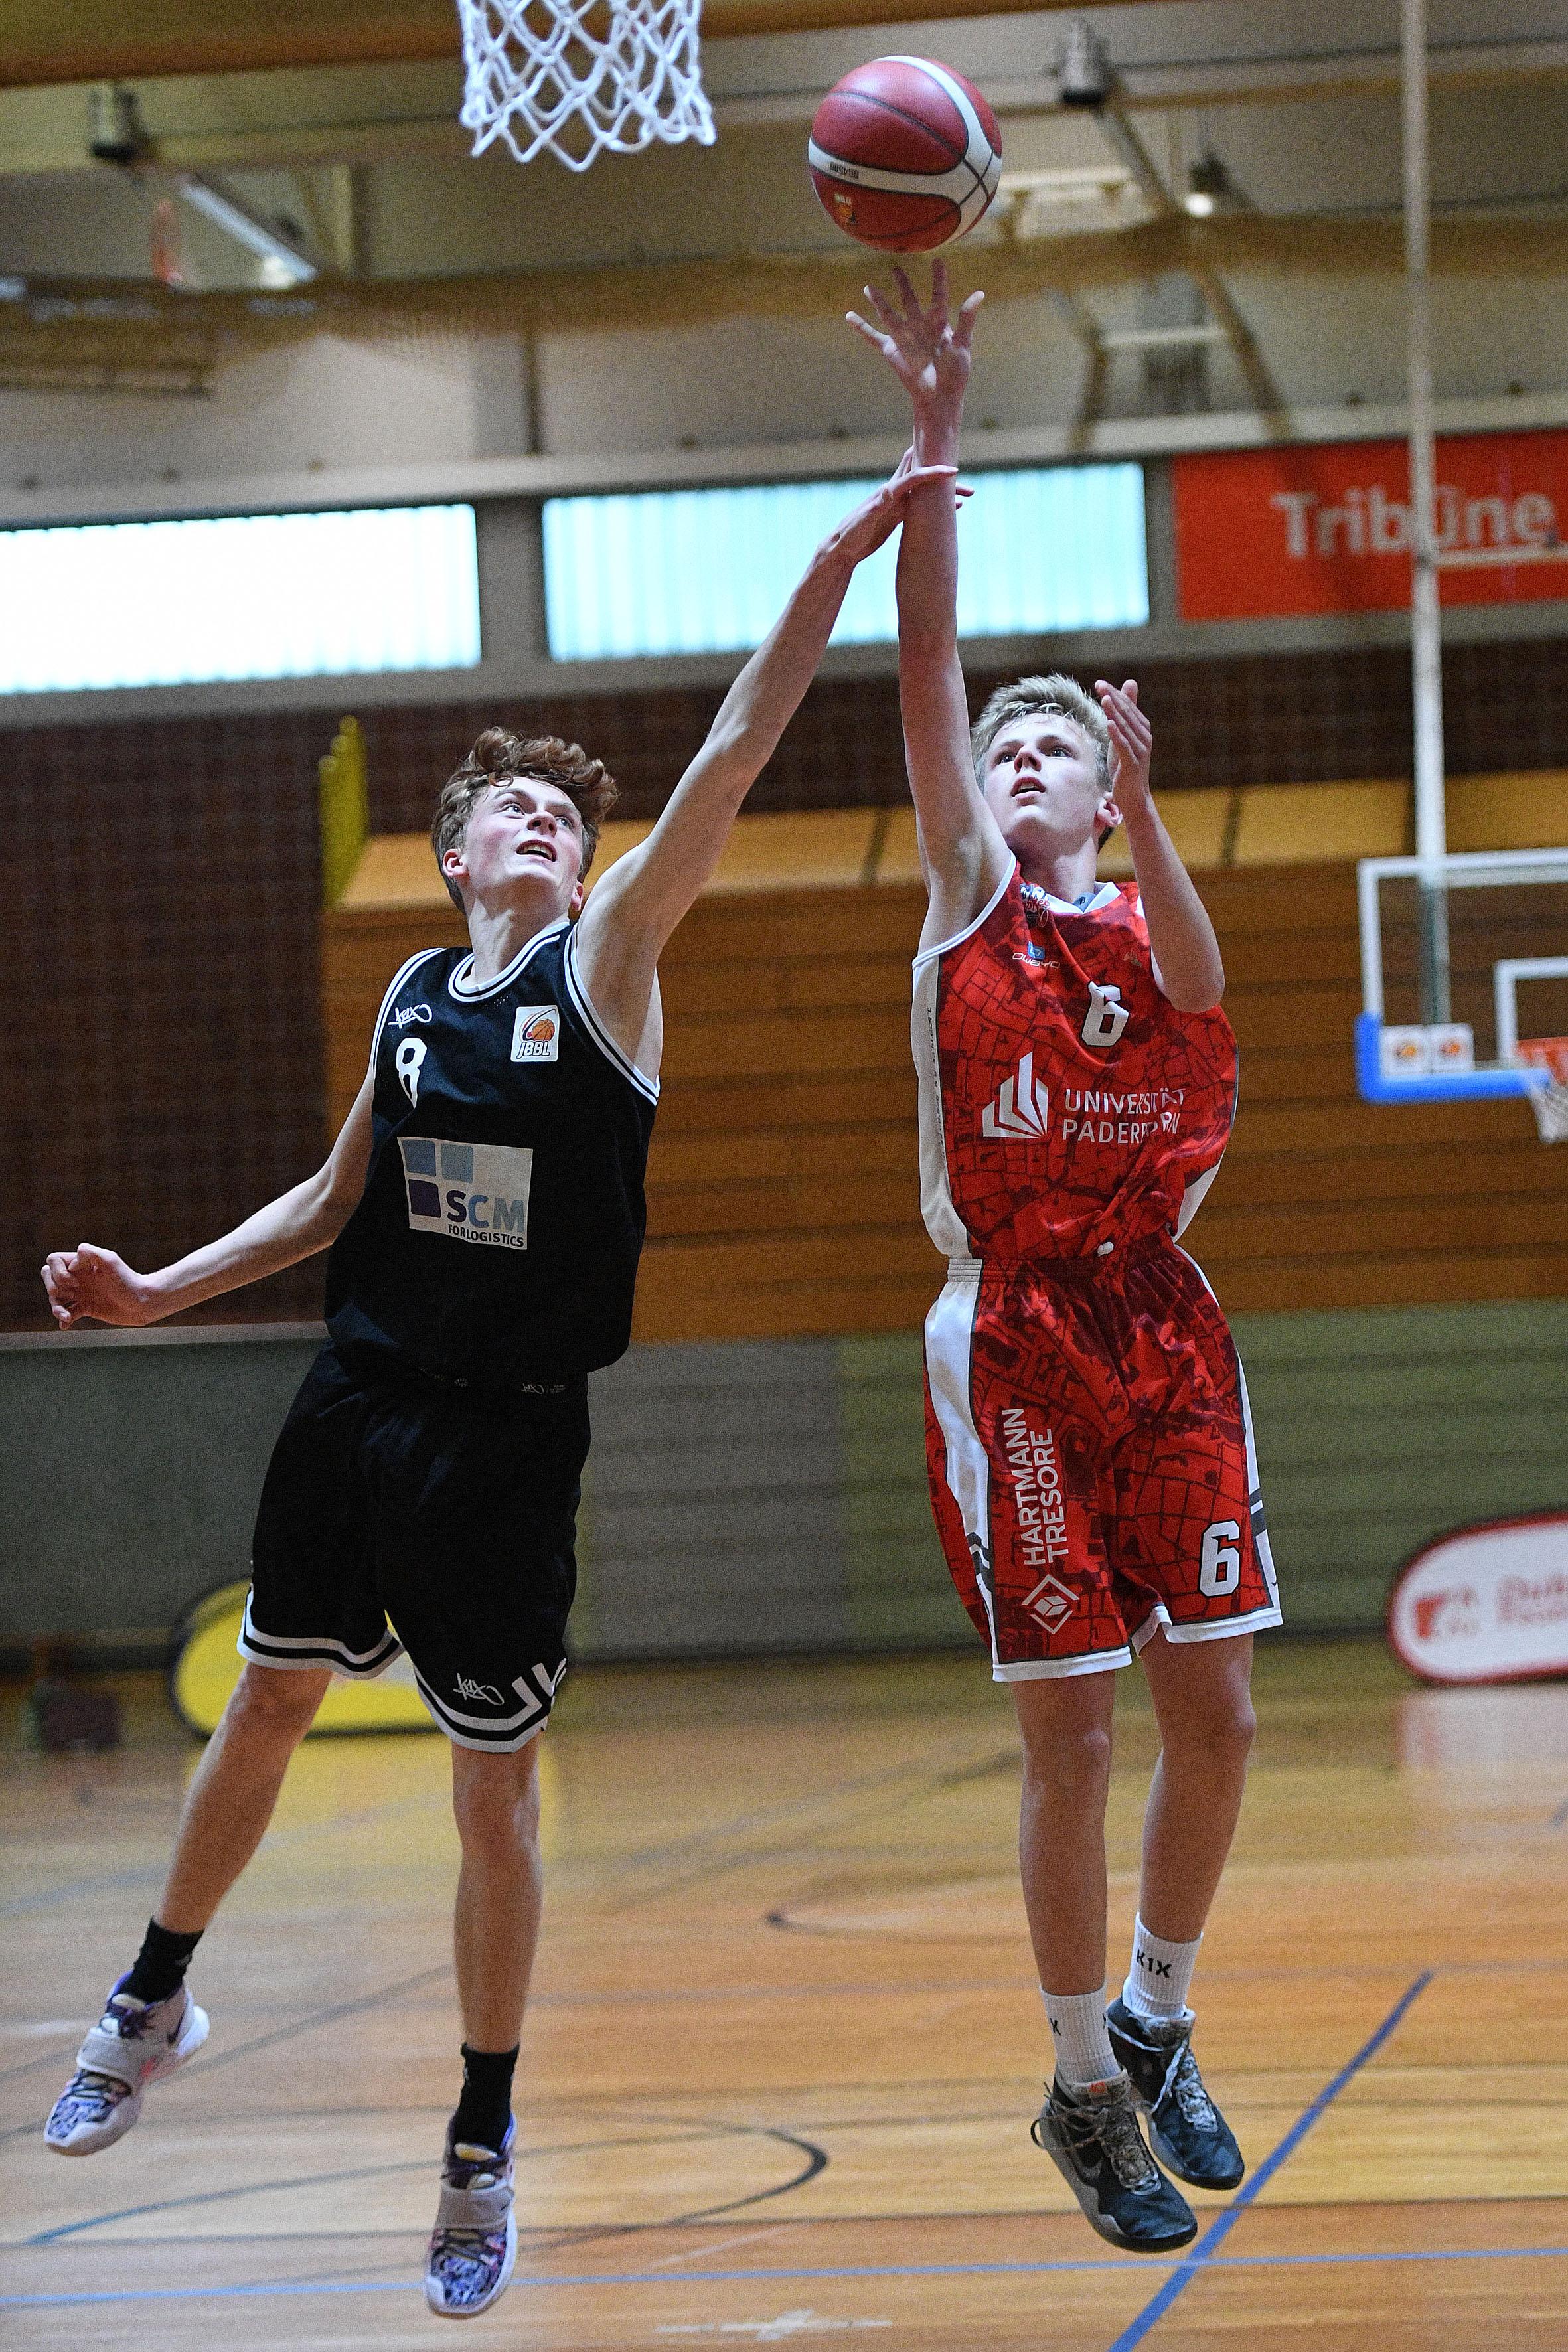 2020-10-18-JBBL-Uni-Baskets-Paderborn-UBC-Muenster_8278